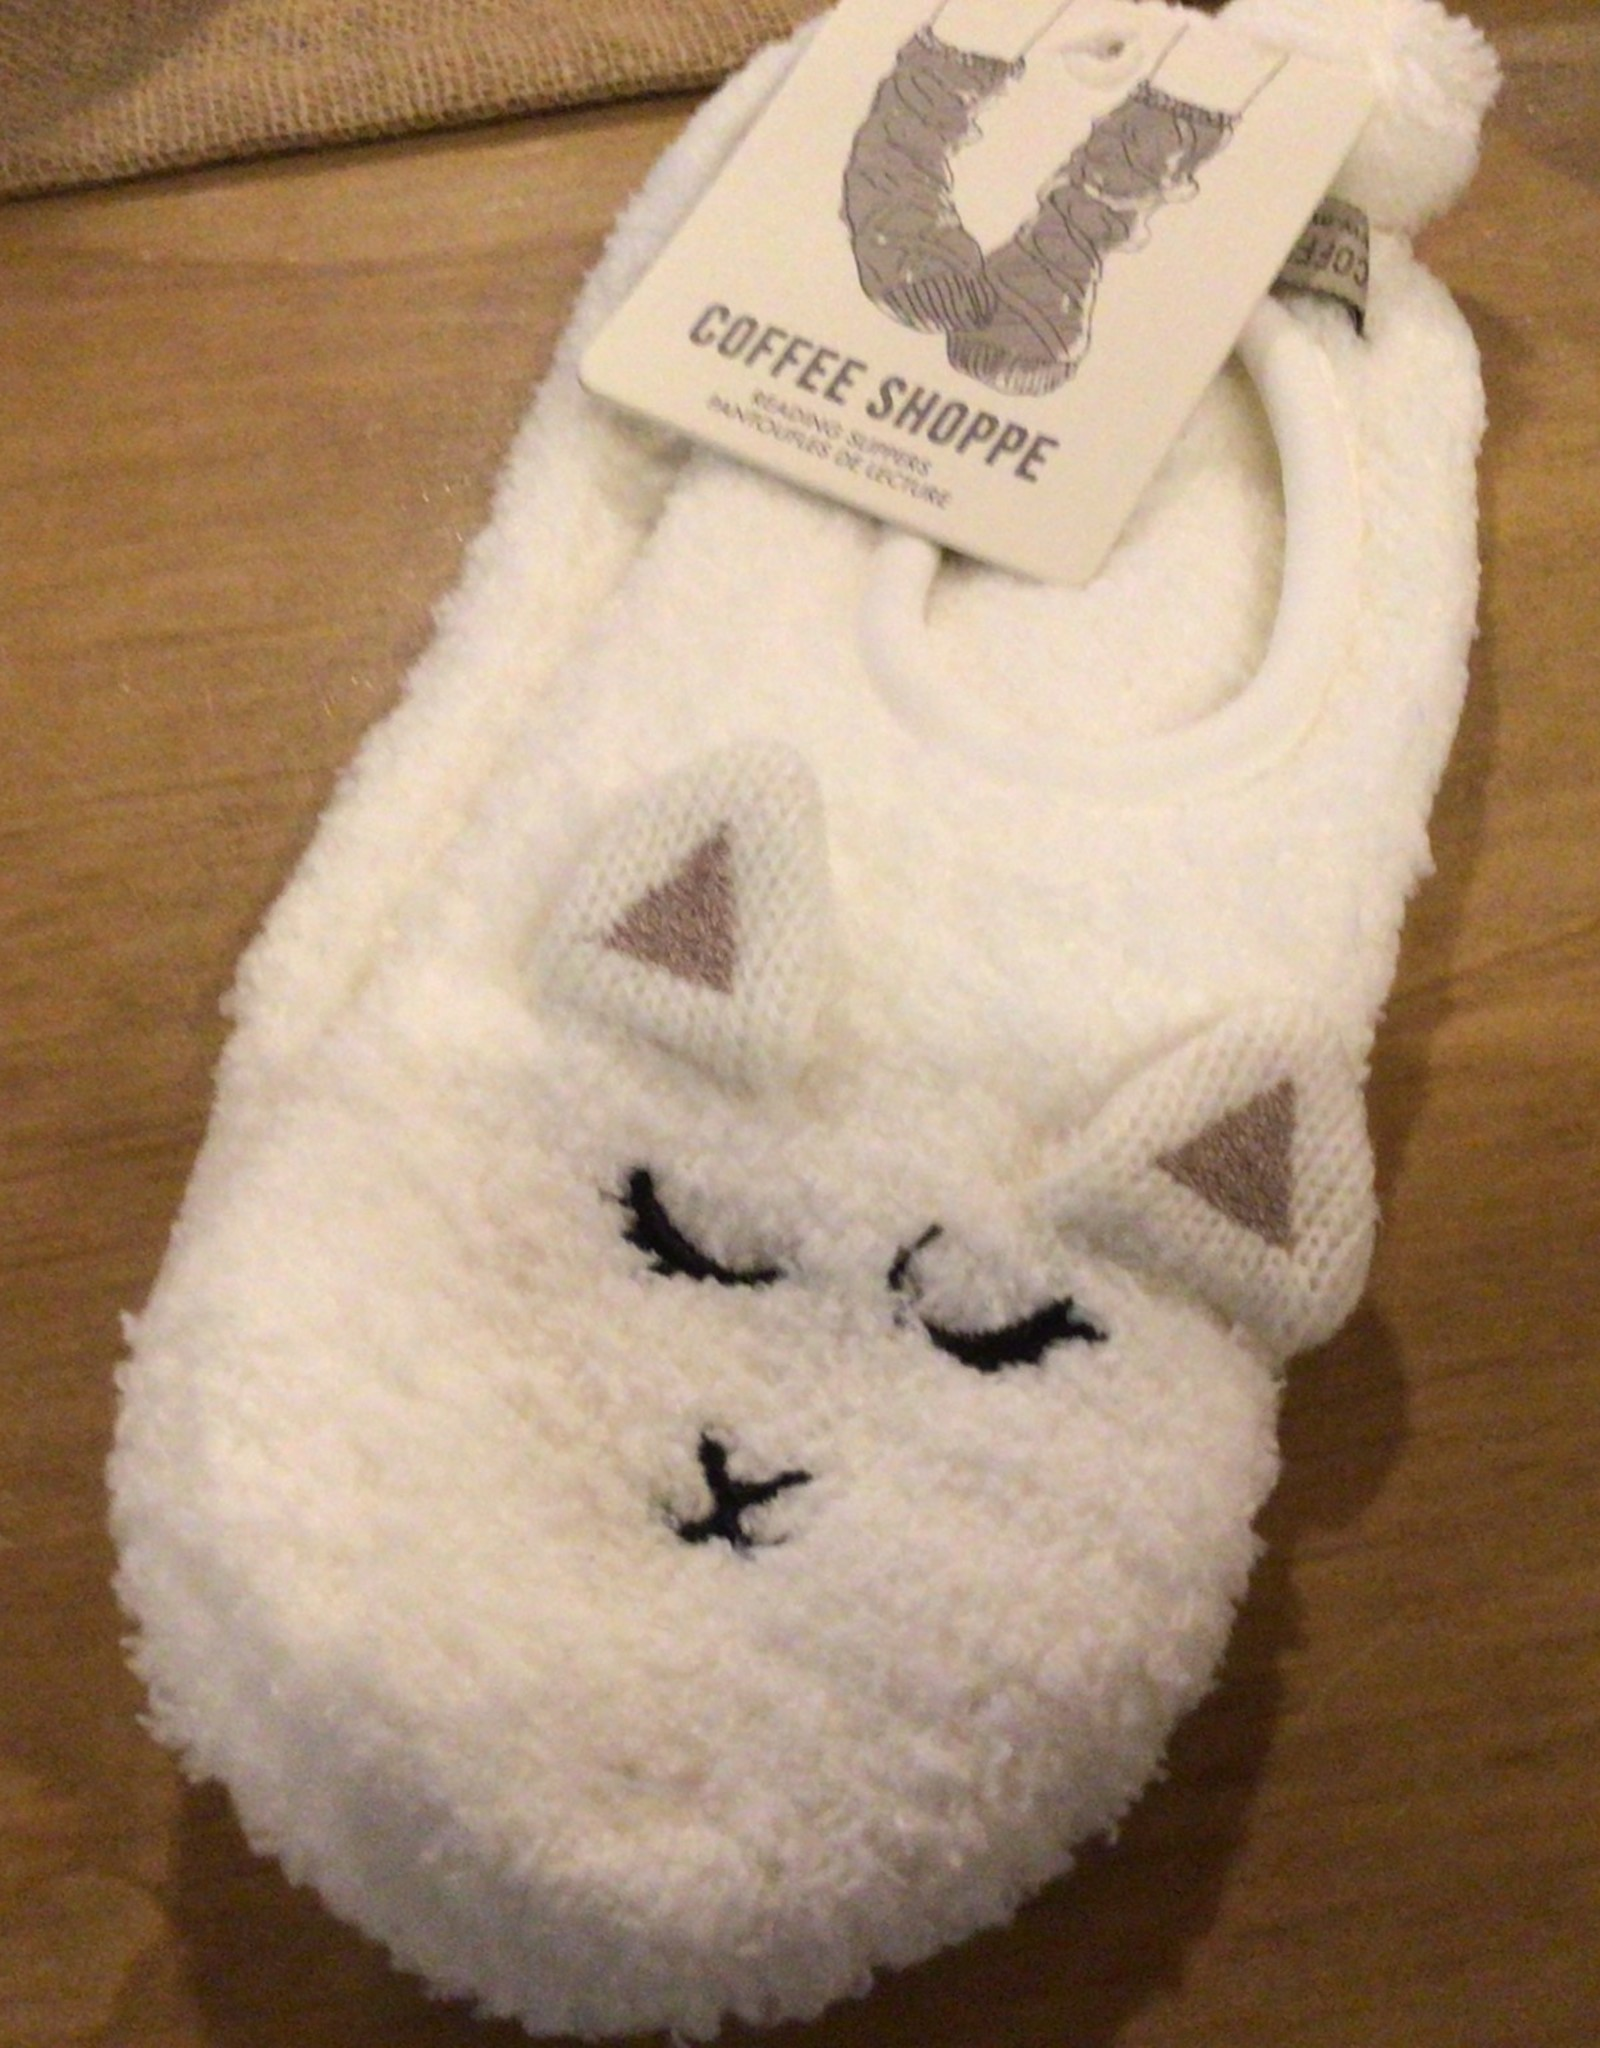 coffee shoppe Animal Footlet Slipper